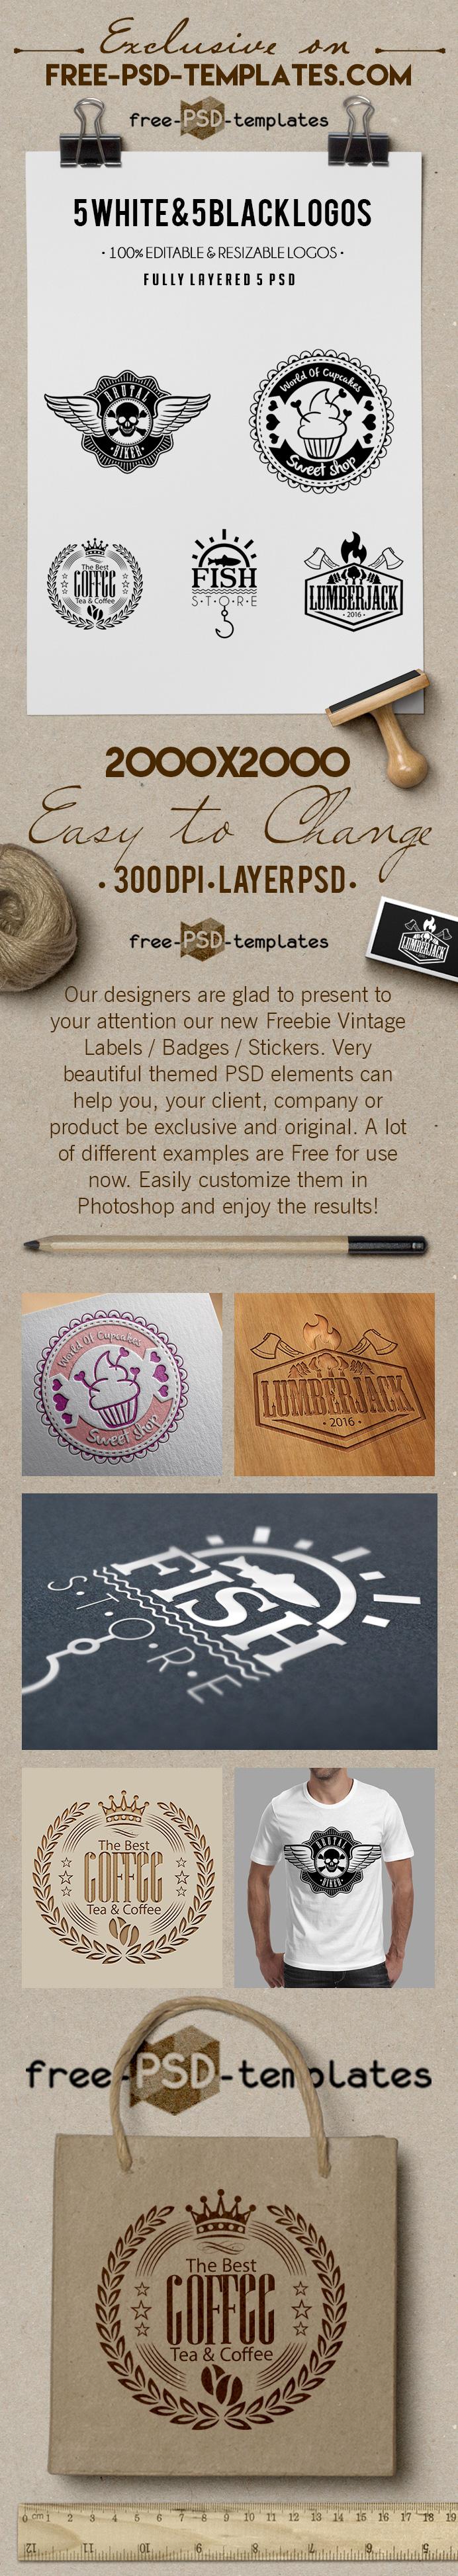 Preview_Logos_&_Badges